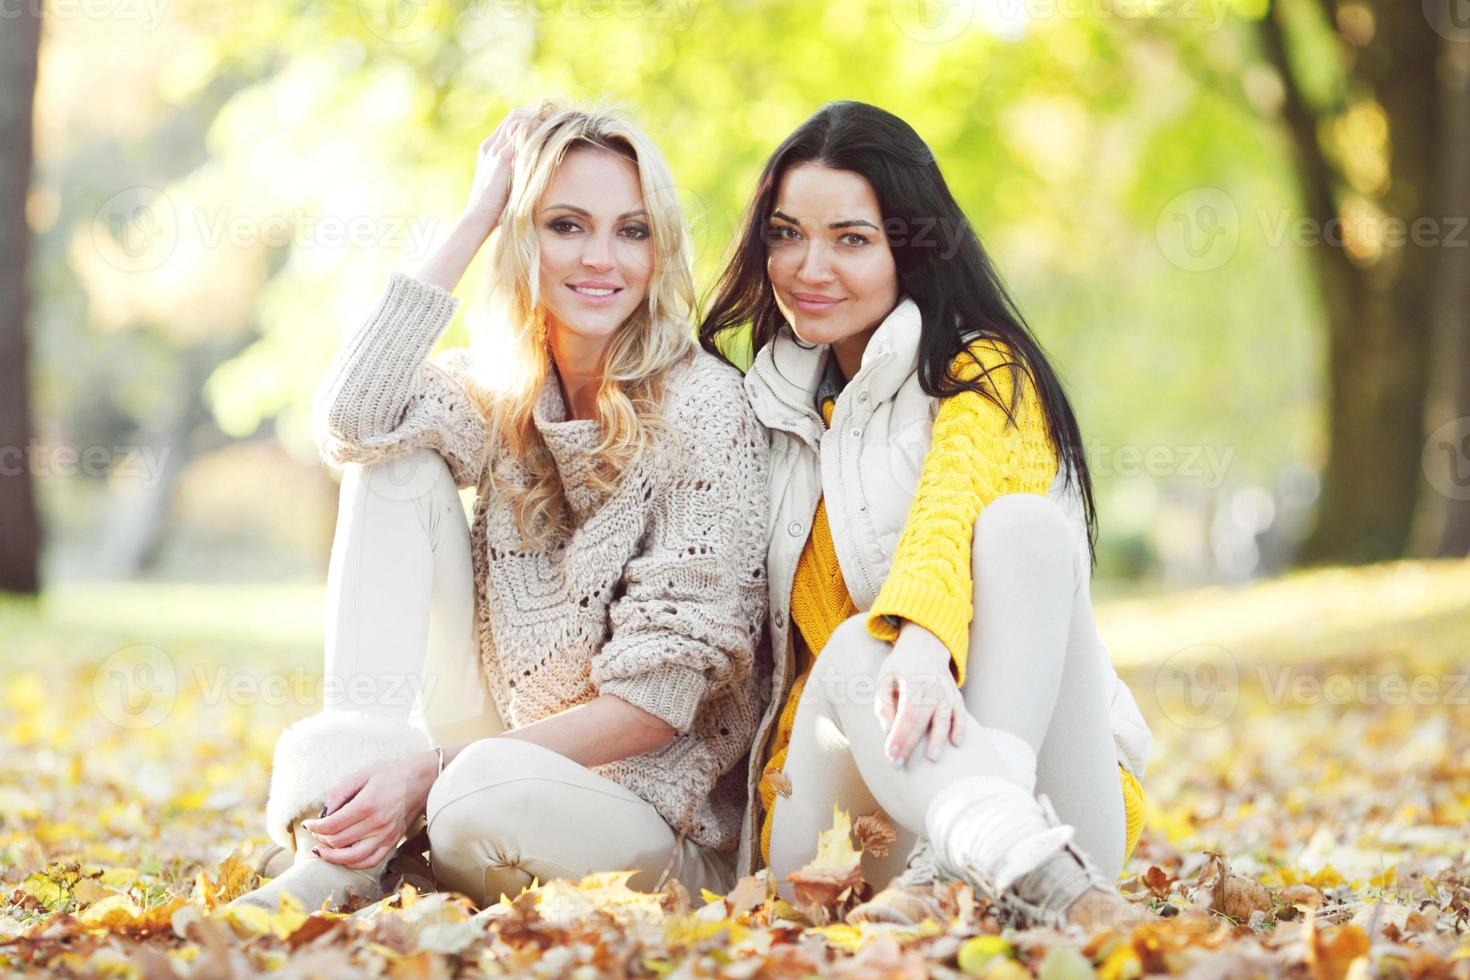 Freunde im Herbstpark foto